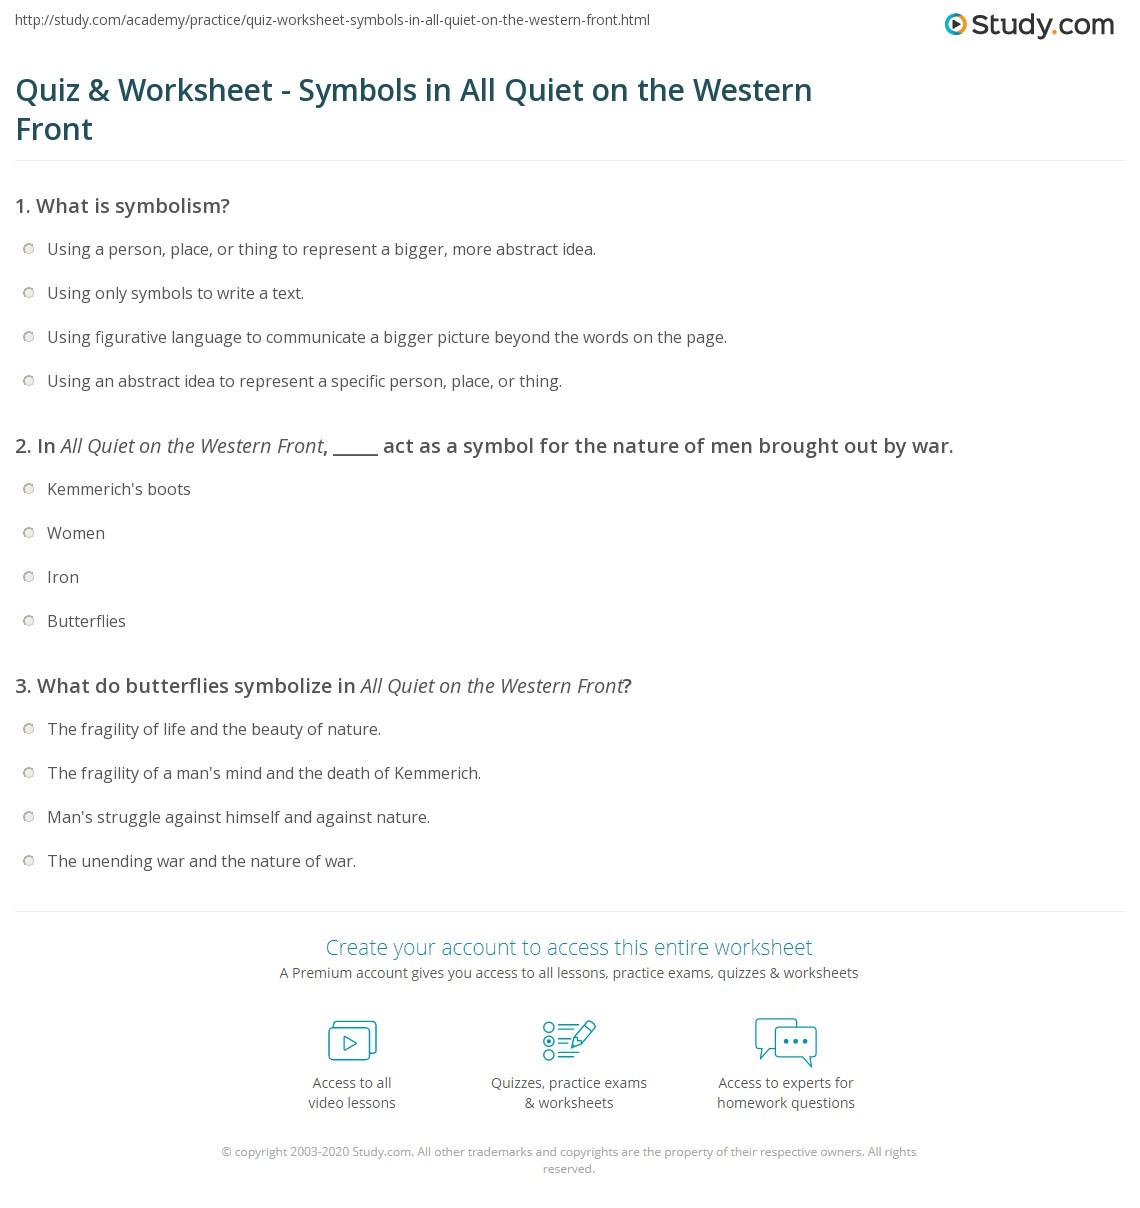 Quiz worksheet symbols in all quiet on the western front print all quiet on the western front symbols symbolism worksheet buycottarizona